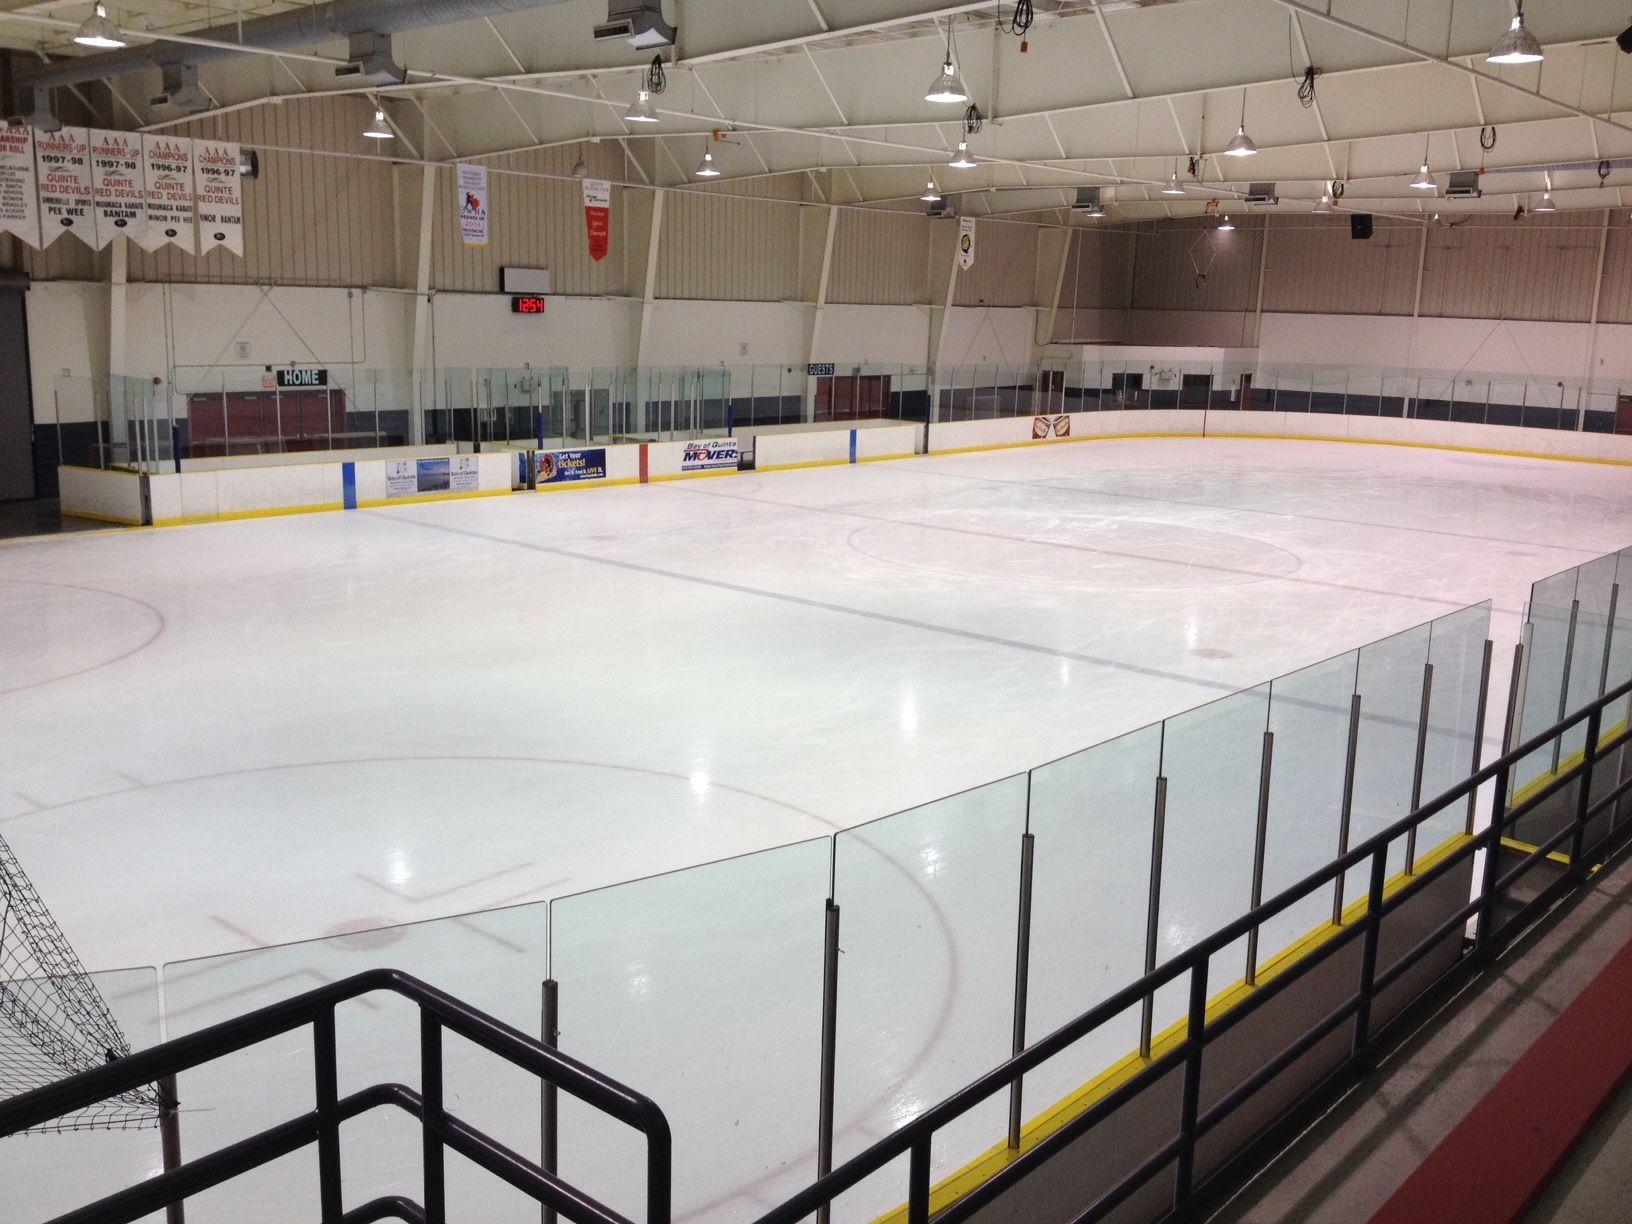 Pin By Adrown On Hockey Rinks Hockey Rink Hockey Basketball